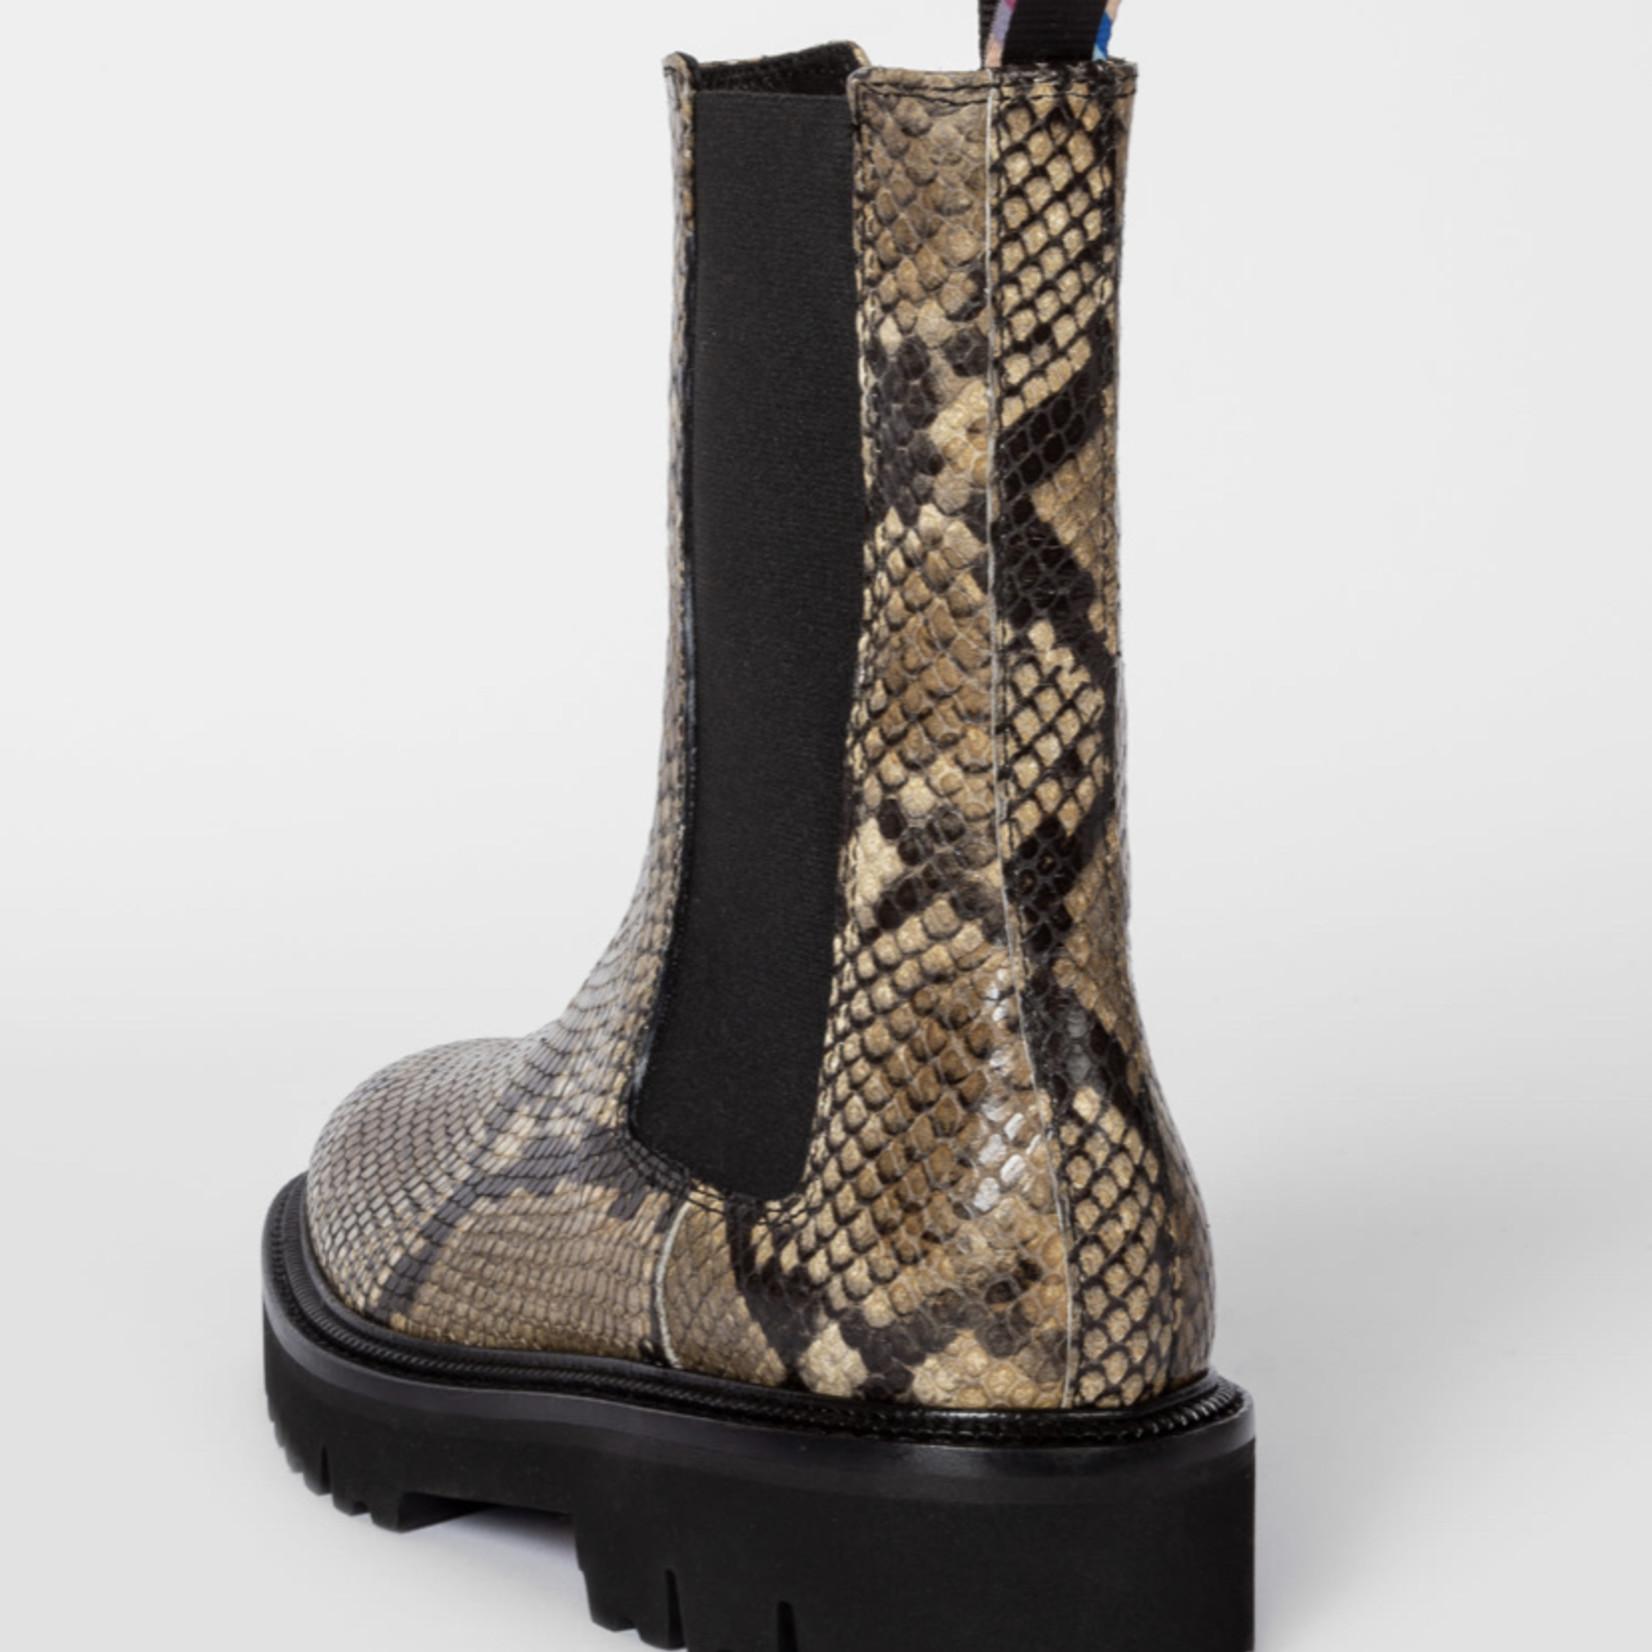 Paul Smith Chelsea boot